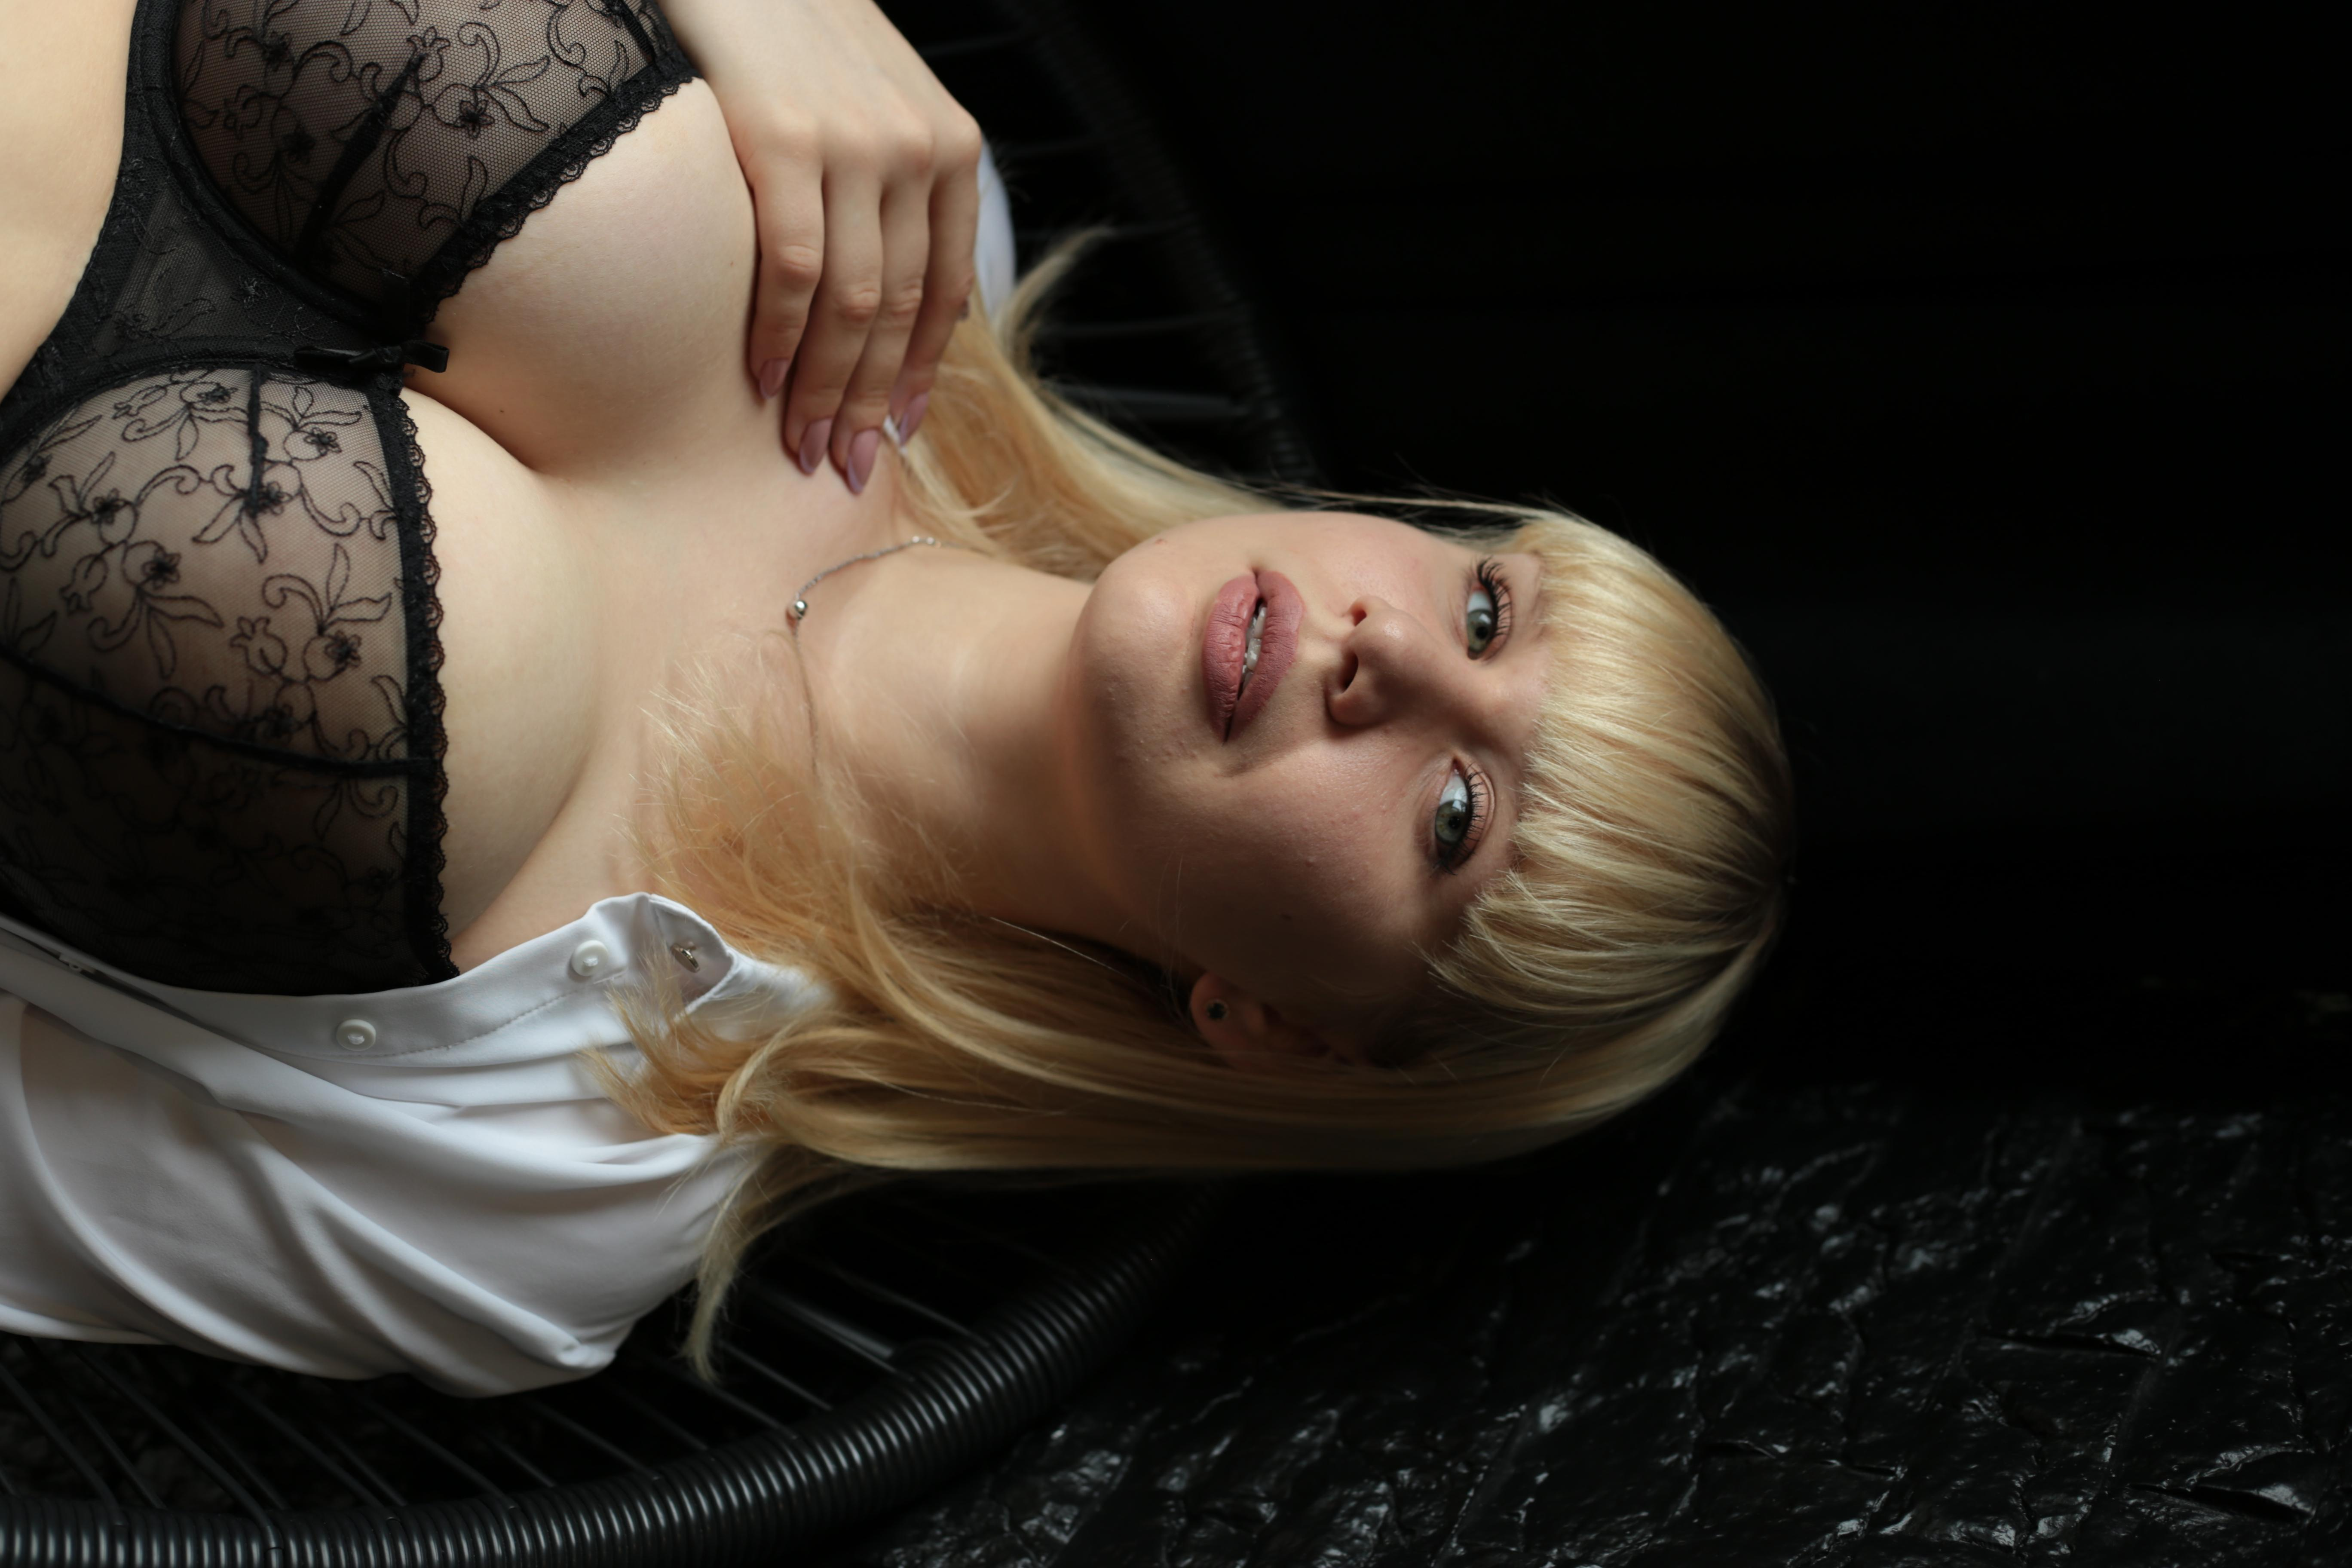 Sky blondex?s=4wcdvbcy8skgqbmlw2xco2yva6nxgani7tmwcwatqw4=